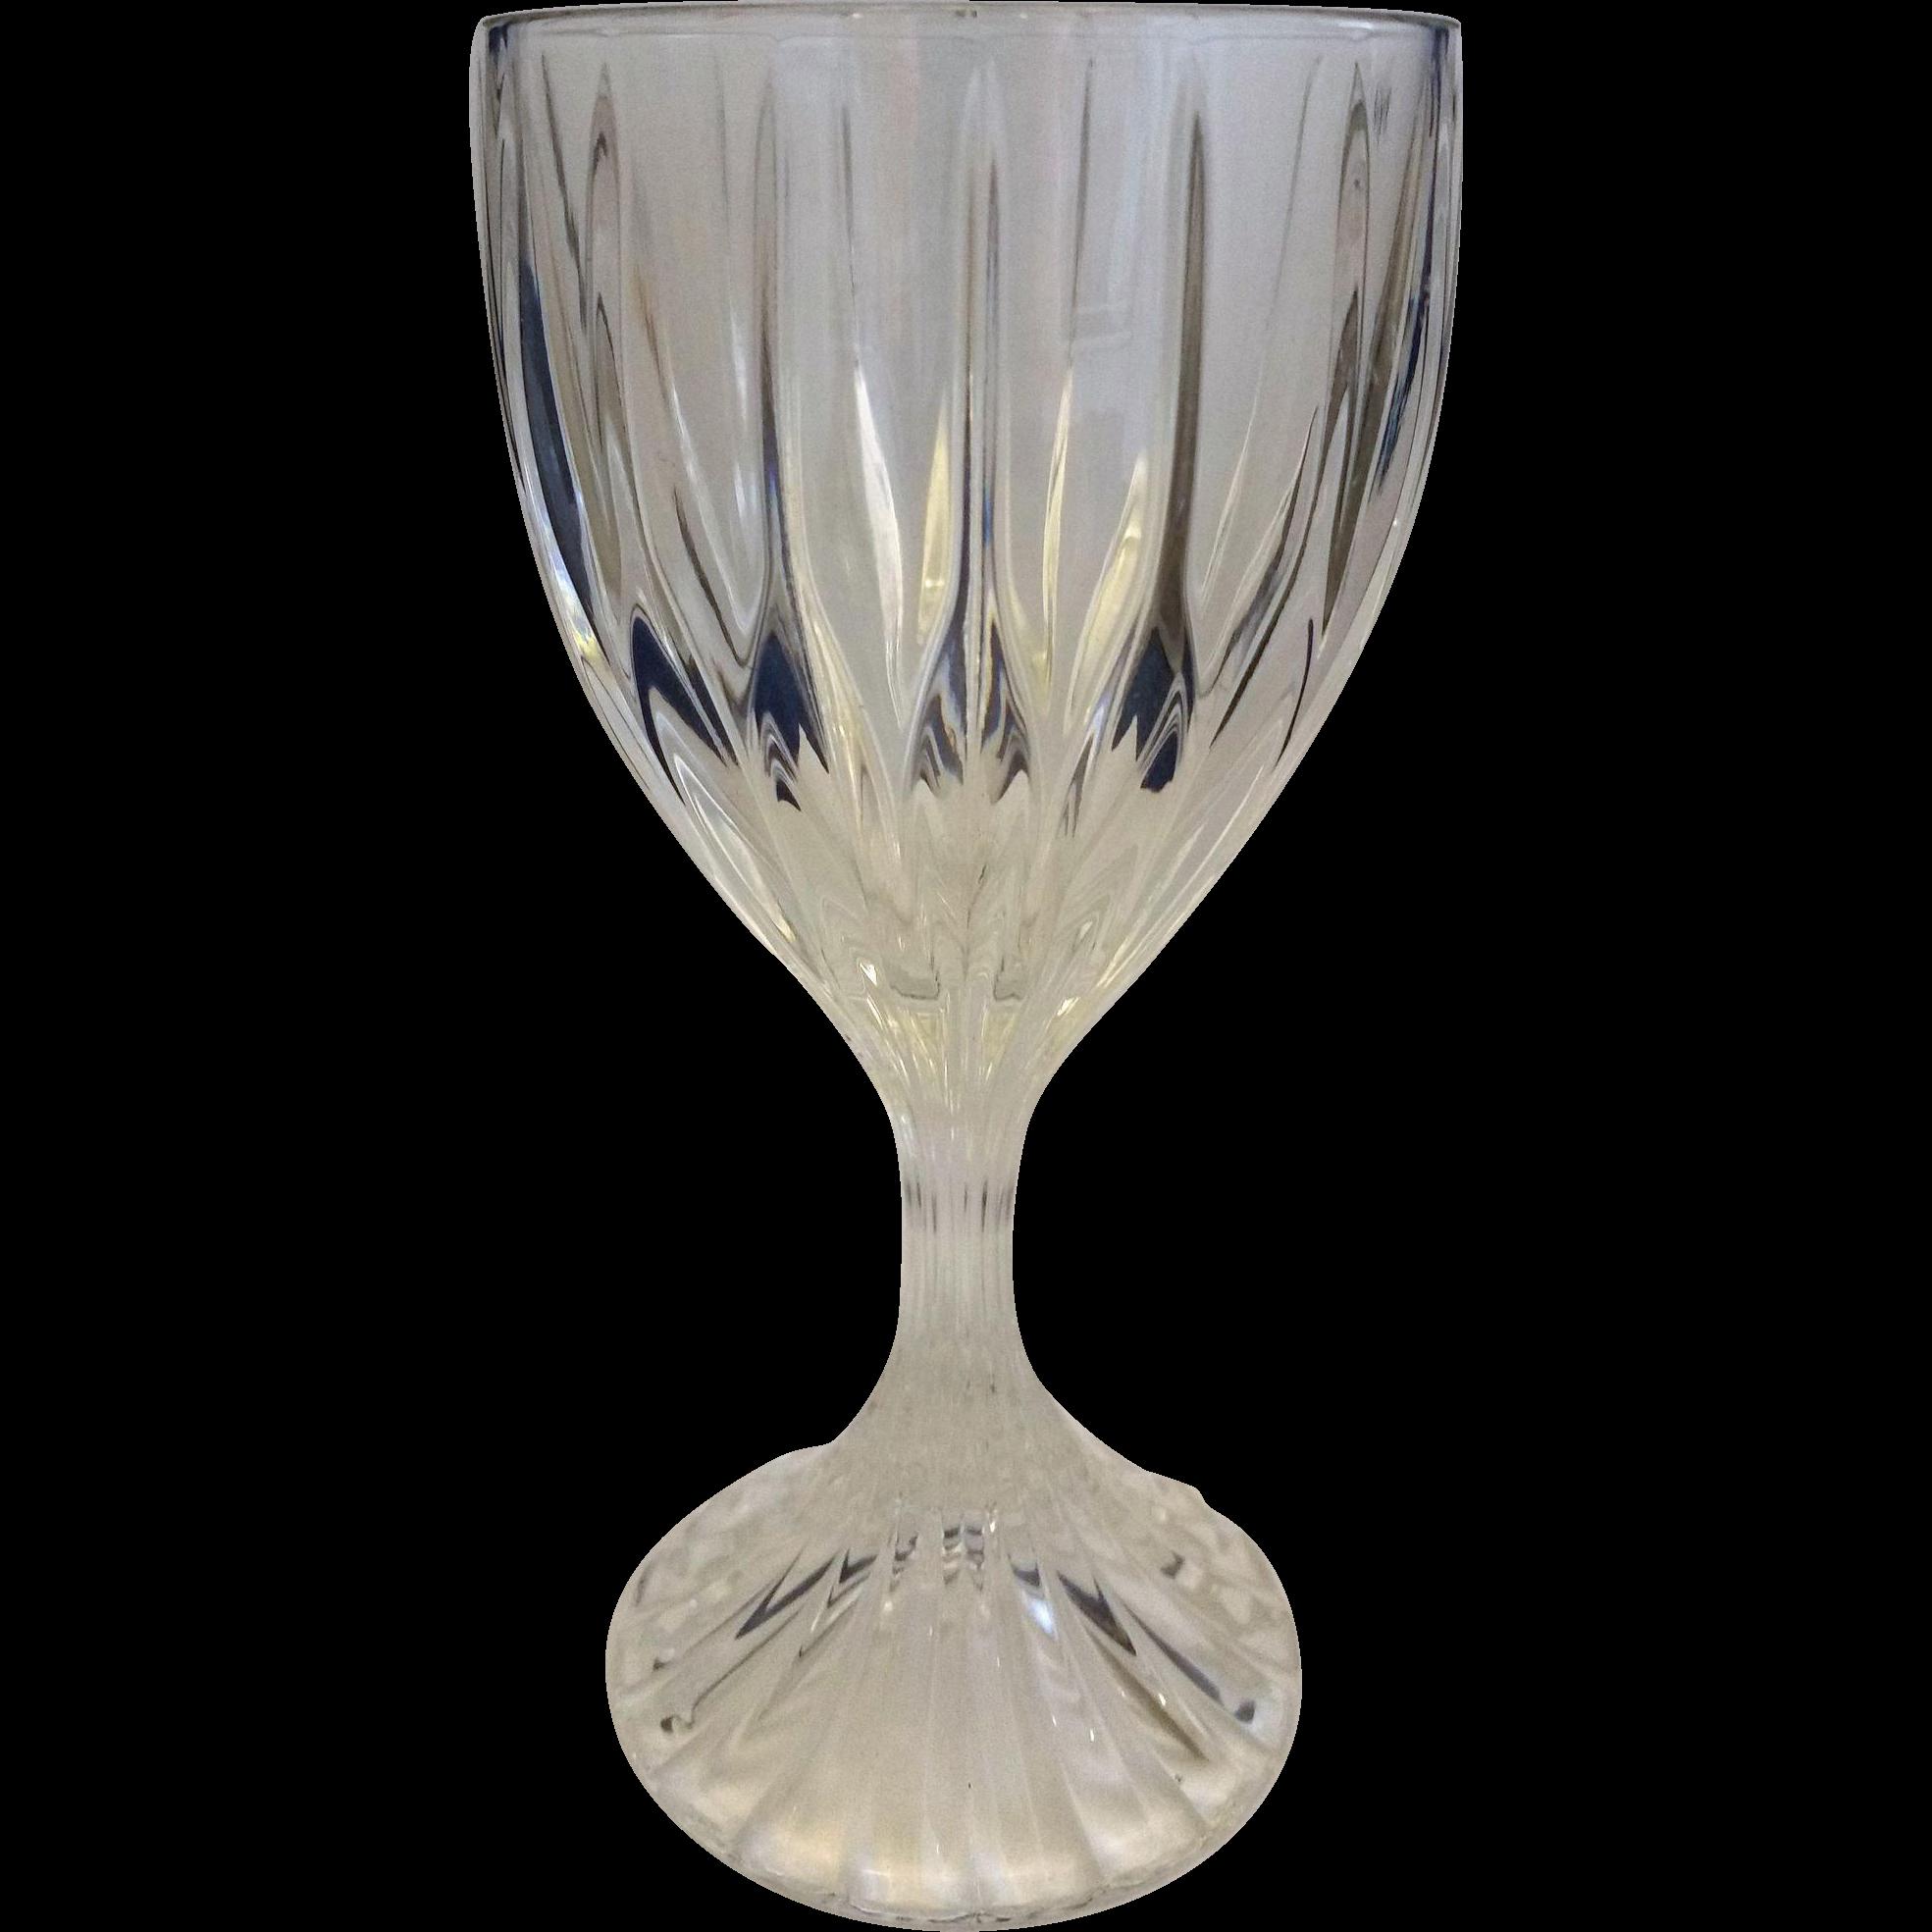 Mikasa Park Lane Crystal Goblet Wine Glass 6 3/8 IN